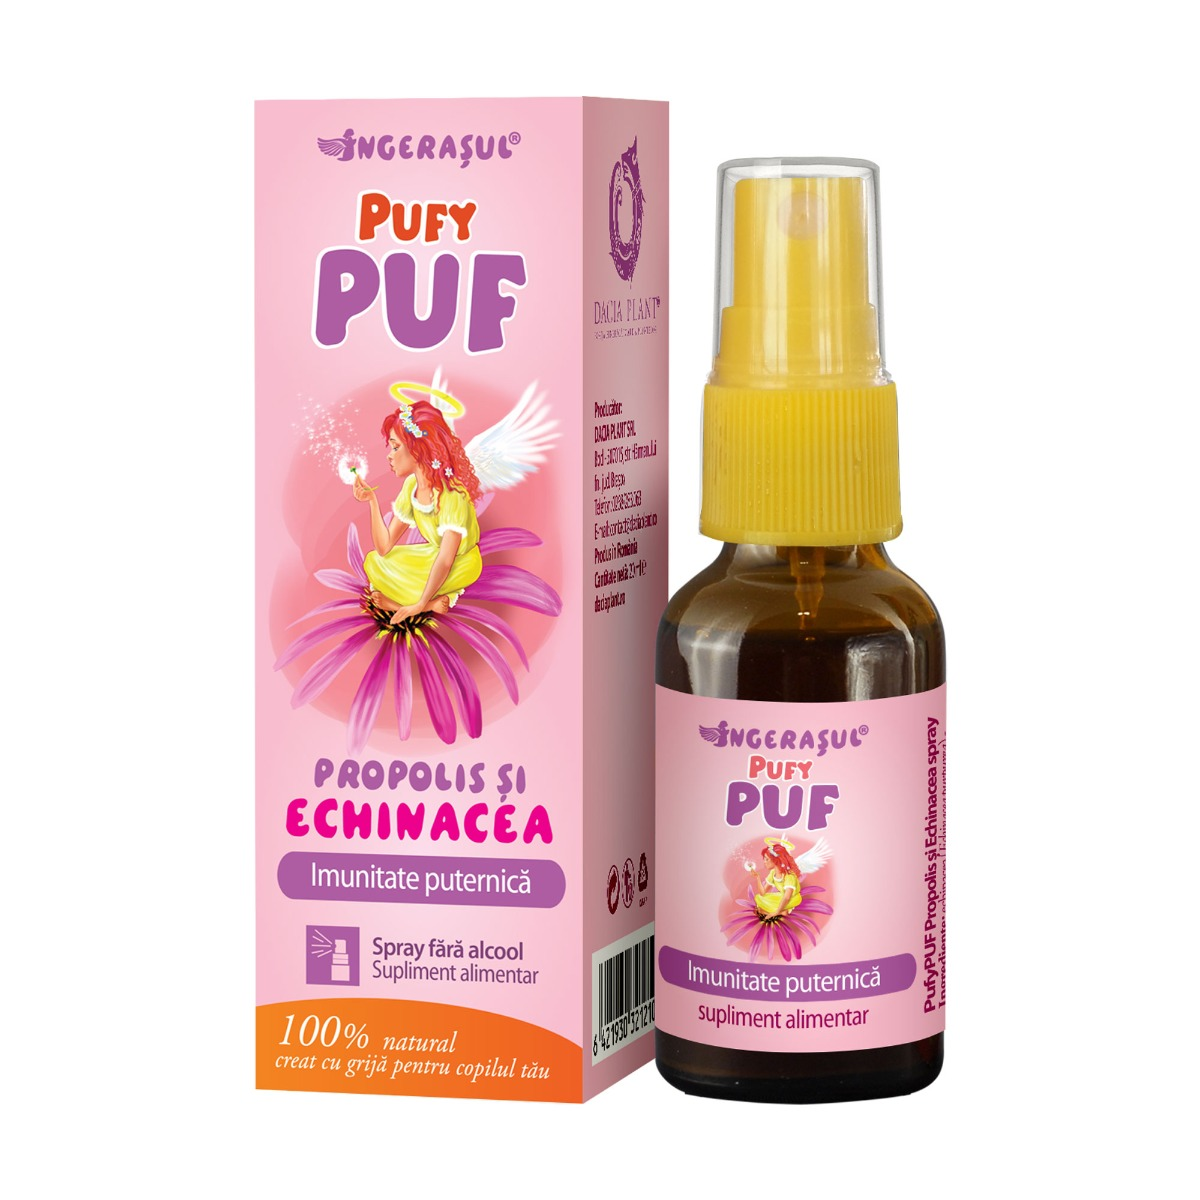 PufyPuf spray propolis si echinacea, 20 ml, Dacia Plant drmax.ro